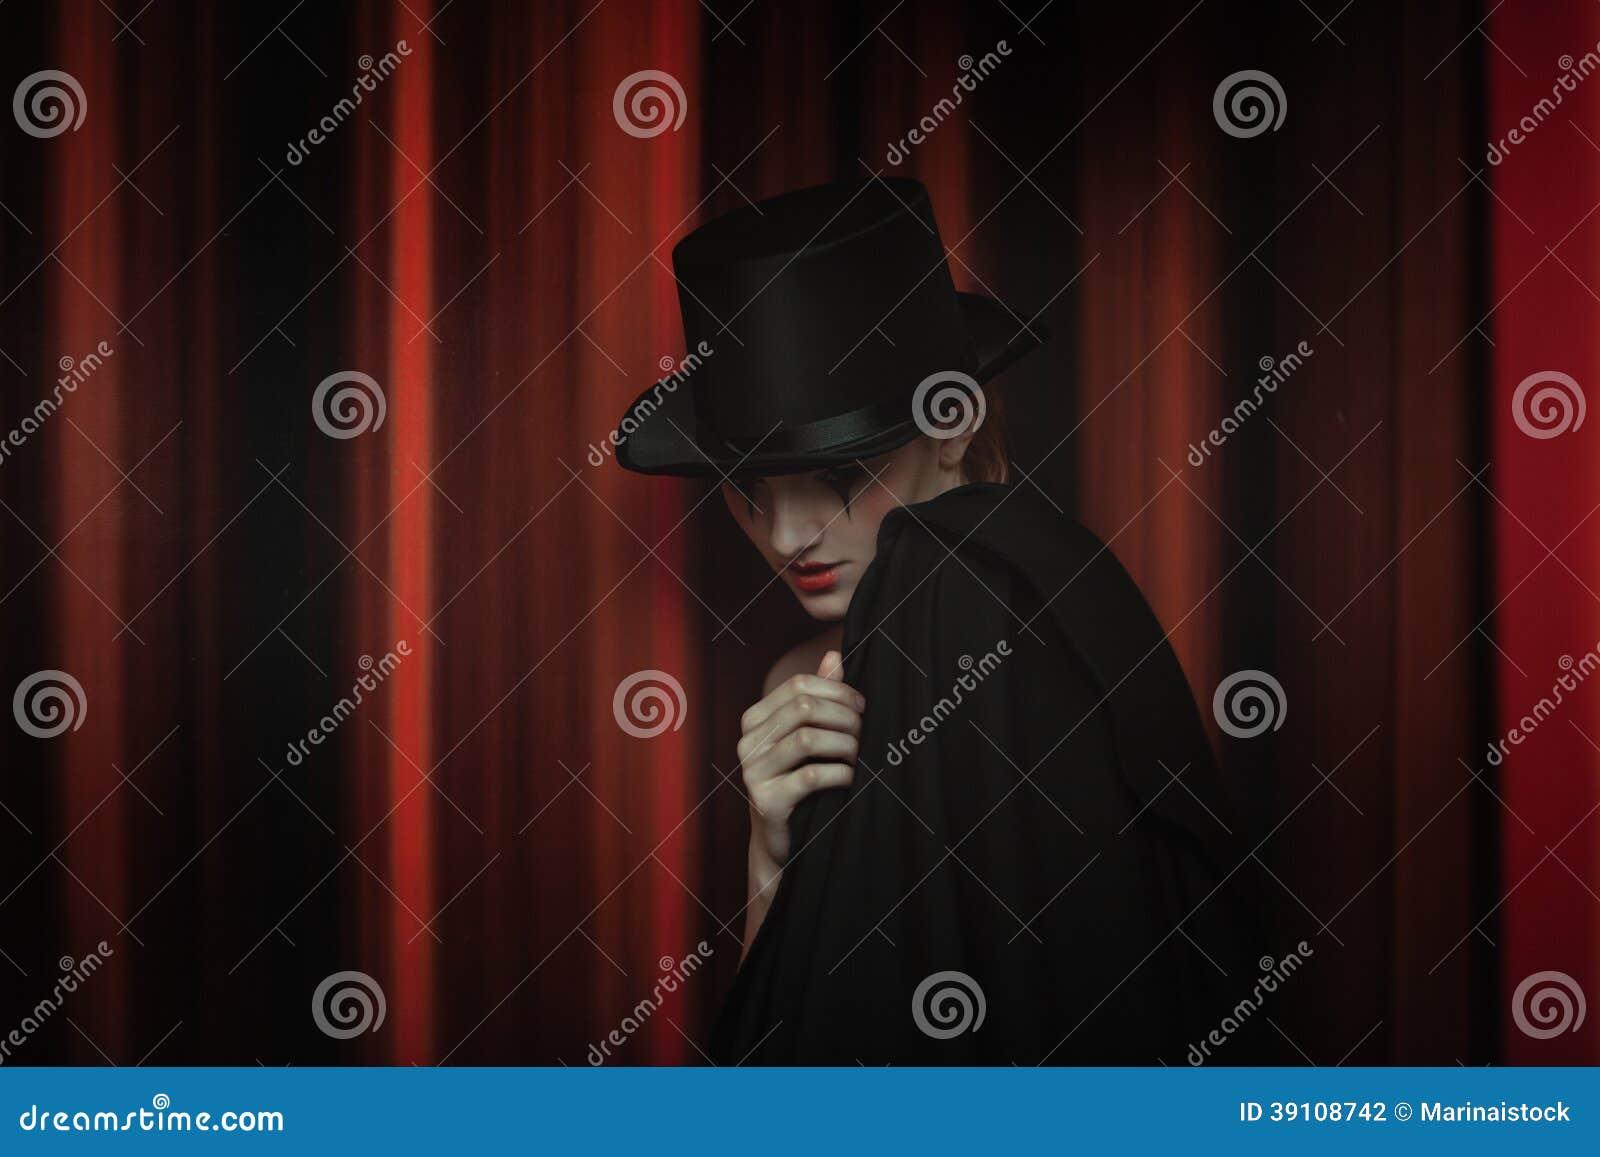 Manier in theater. Drama